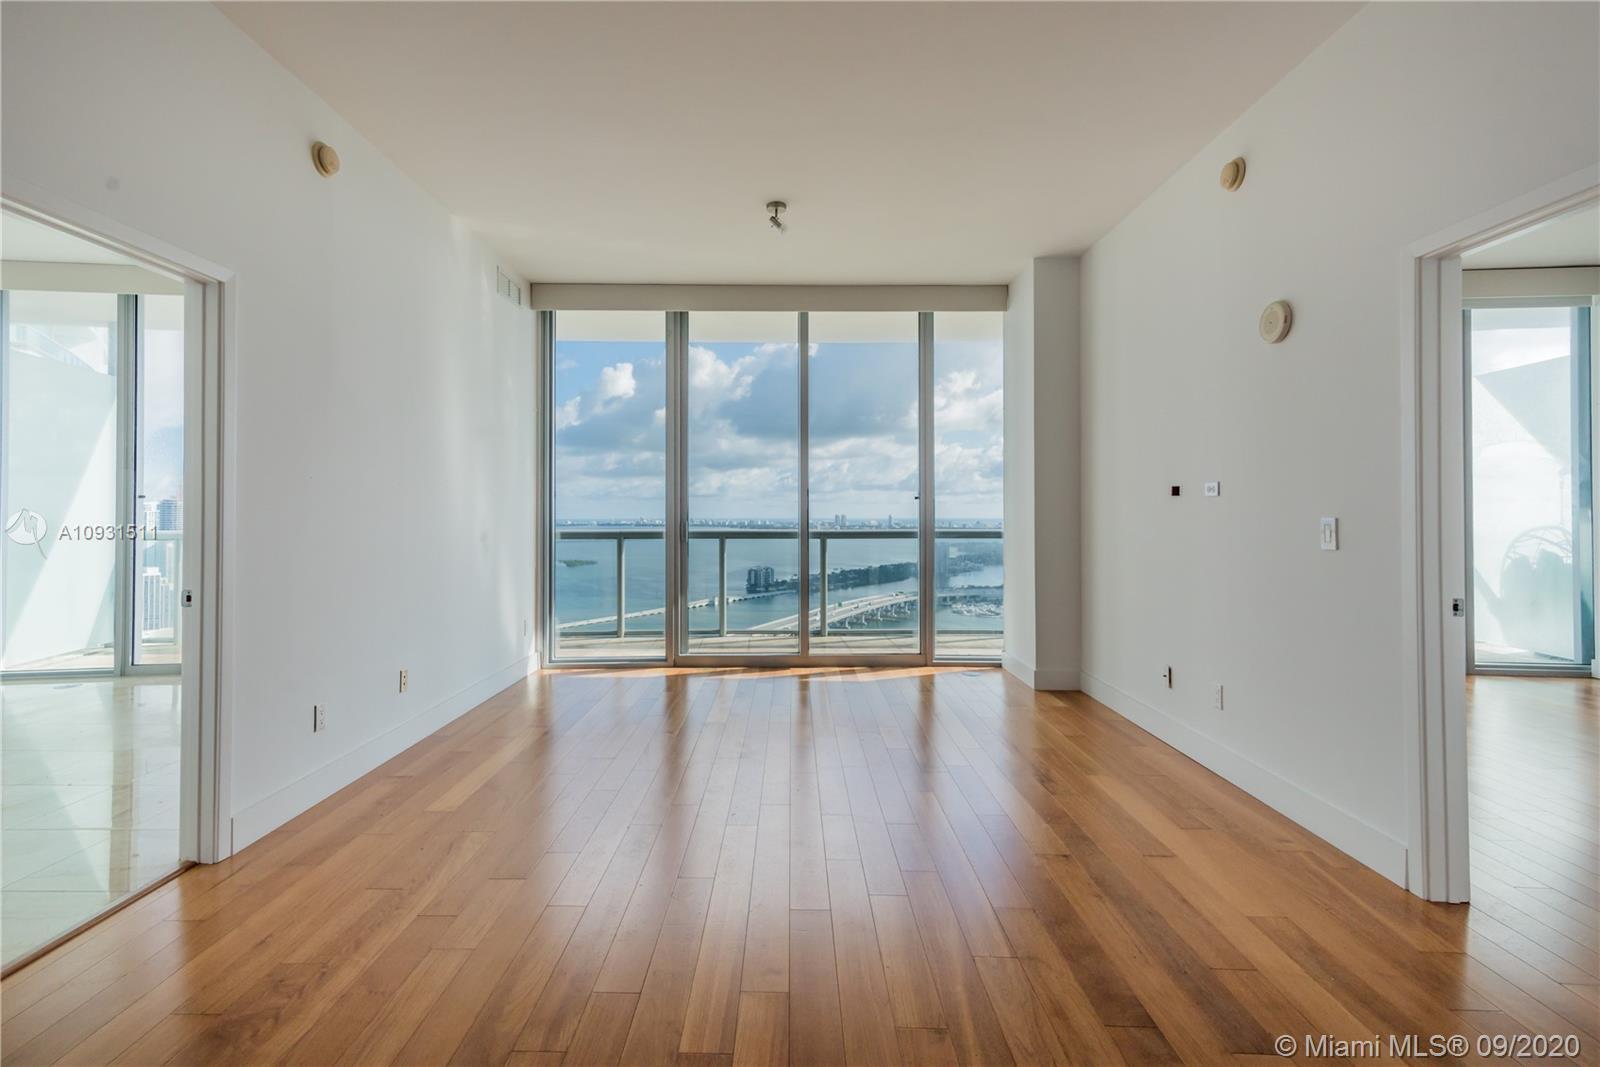 Impeccable 2 bedroom / 2 bathroom +half bathroom condo at Marina Blue. This unit features gorgeous C